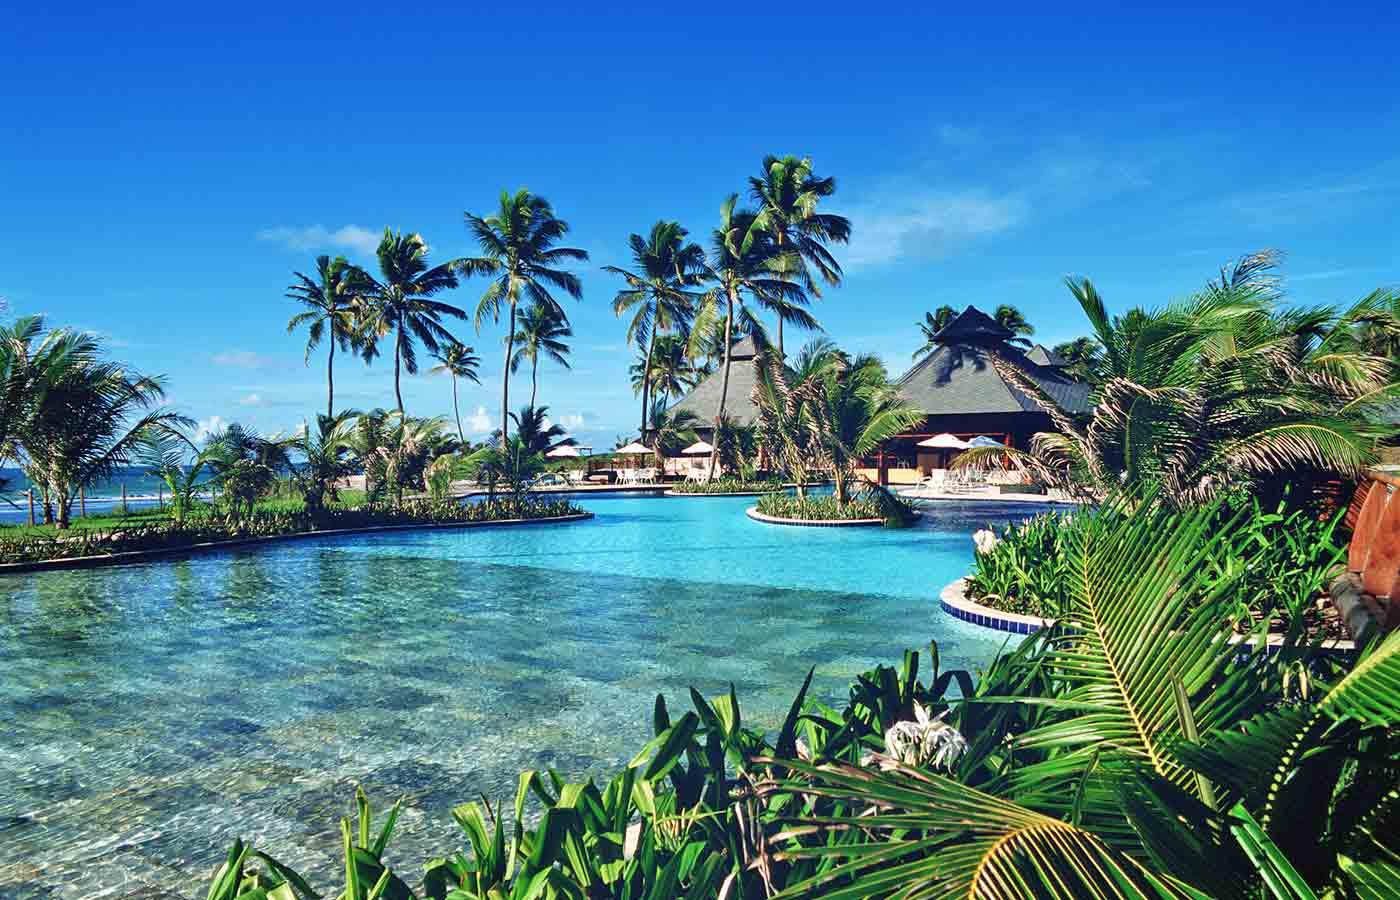 Nannai Resort & Spa - Luxury holidays to Porto de Galinhas, Brazil